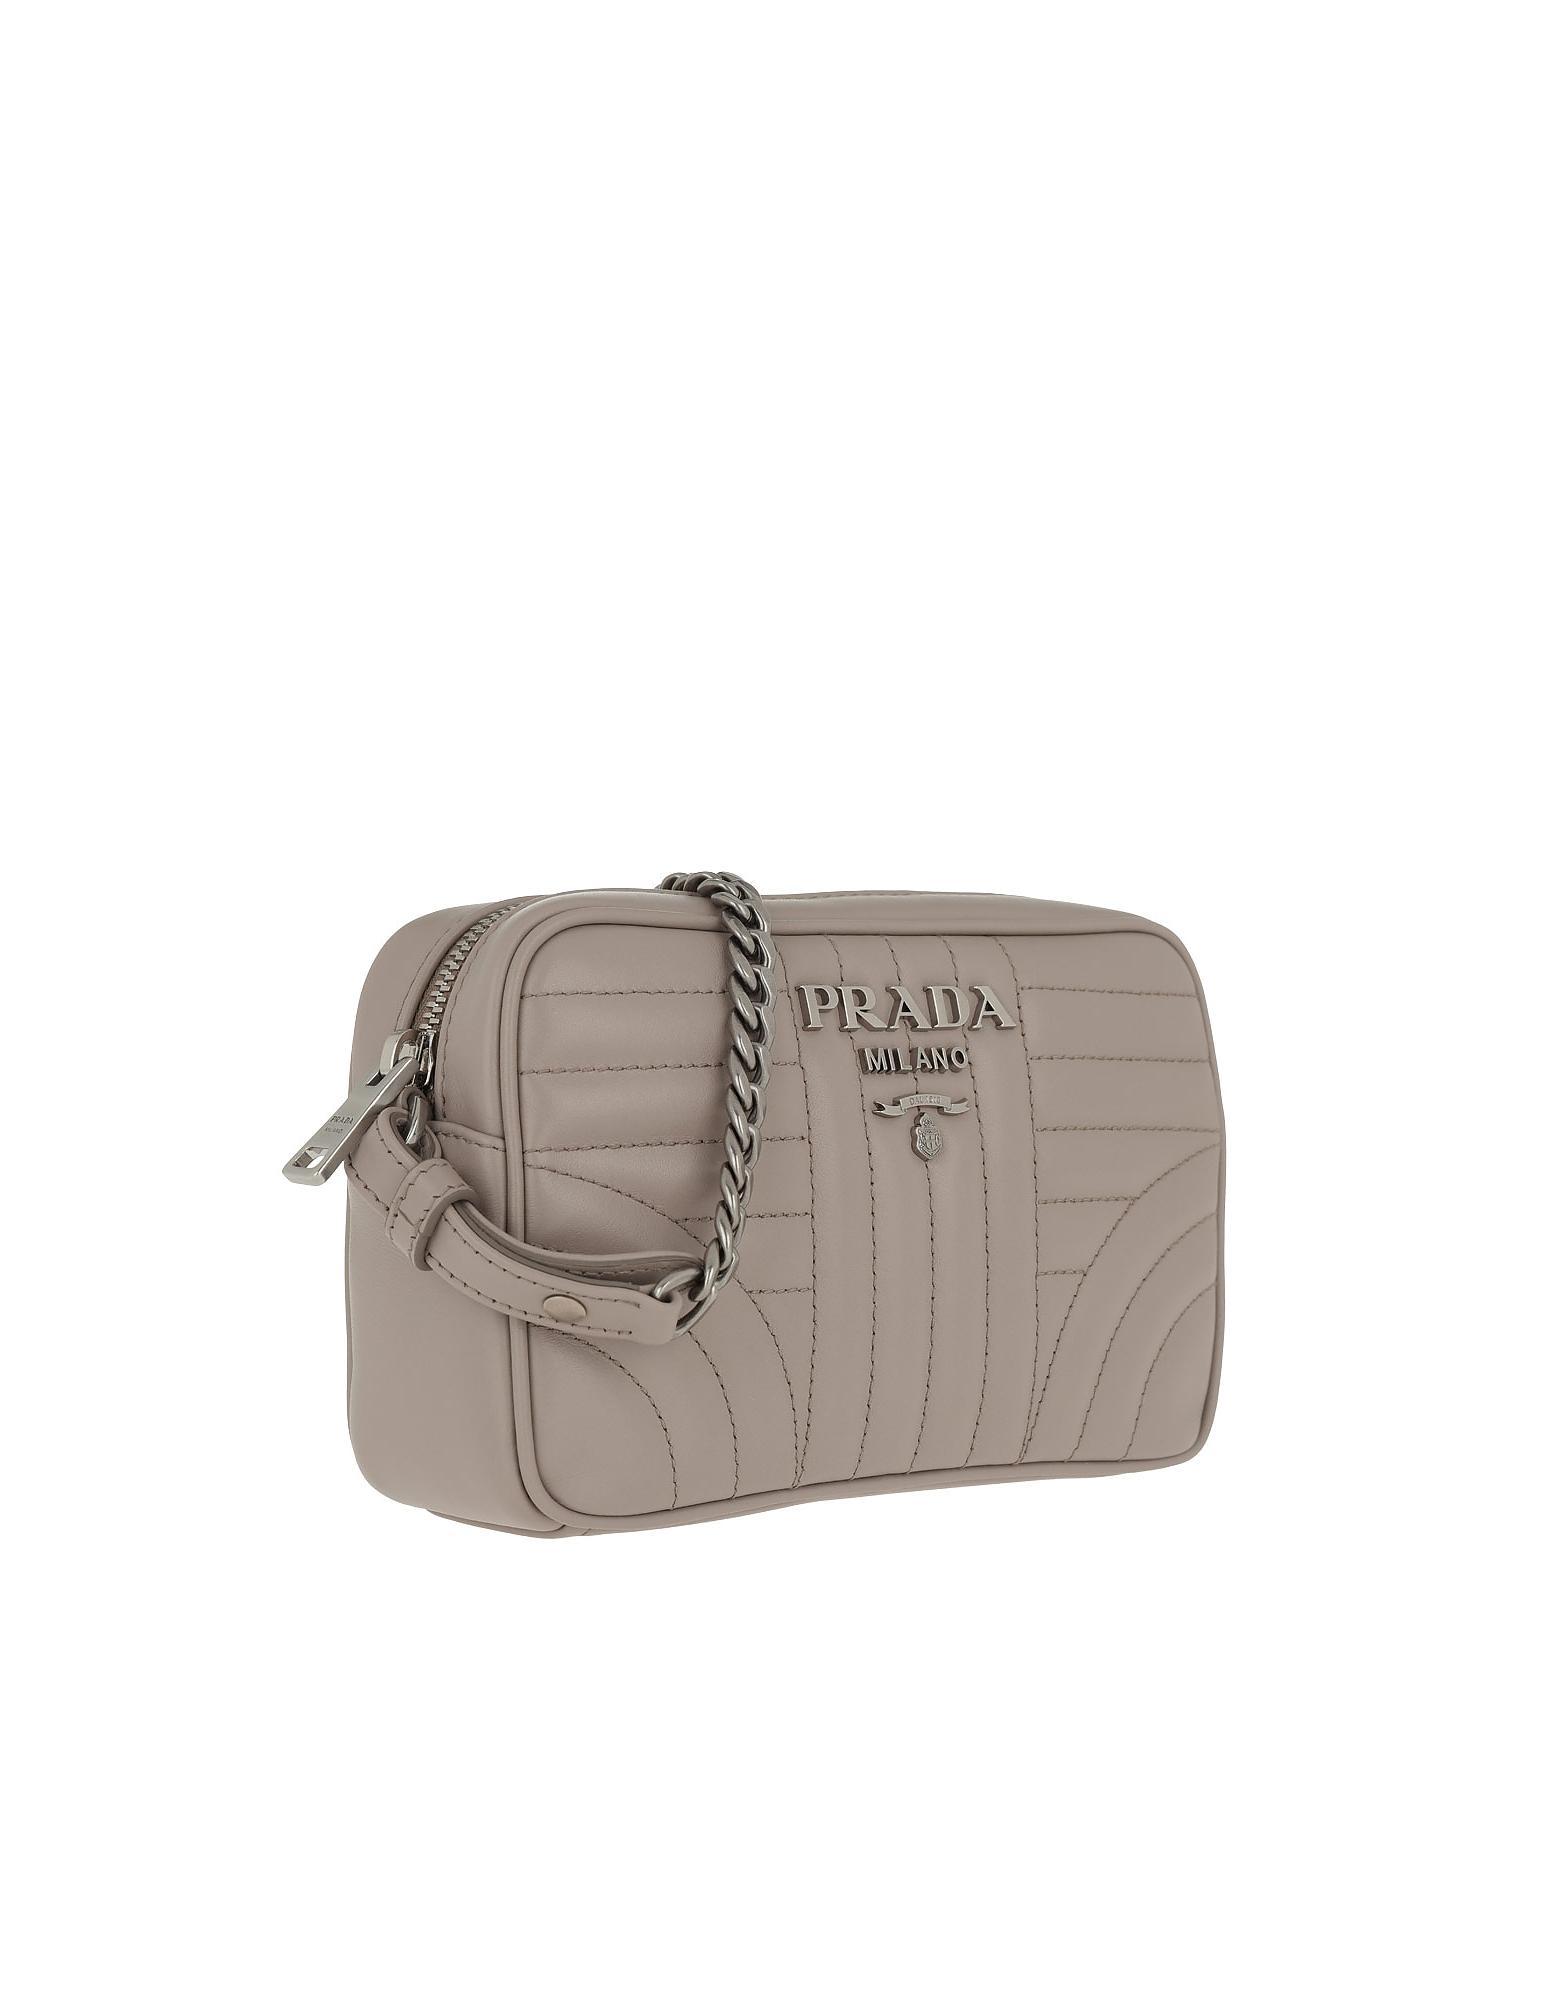 0fc074c8608 Lyst - Prada Diagramme Crossbody Bag Leather Pomice 2 in Pink